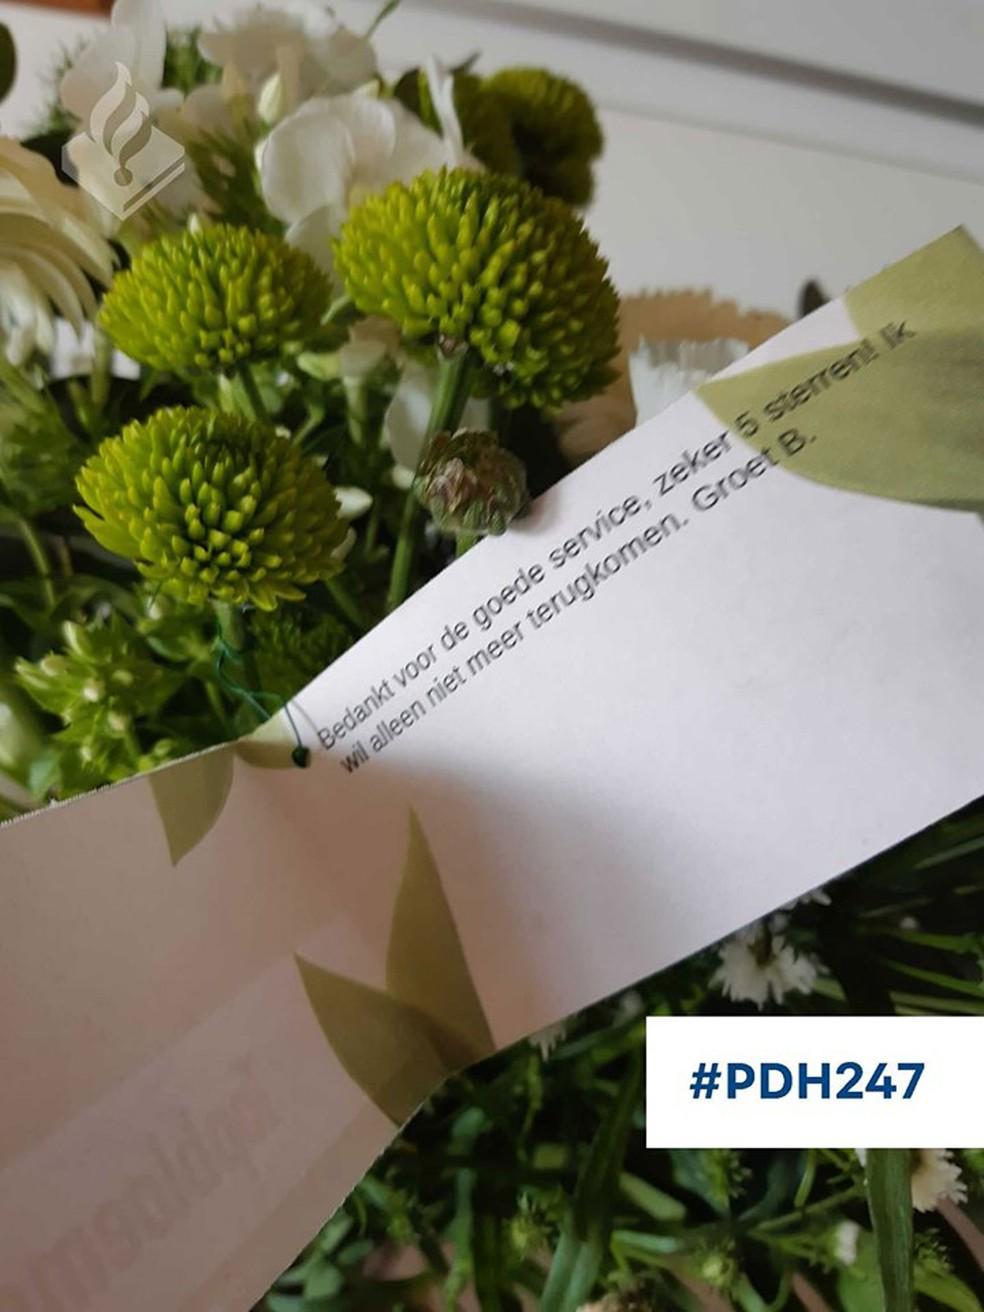 Ex-preso agradece por 'serviço 5 estrelas' que recebeu na prisão na Holanda — Foto: Politie Den Helder/Facebook